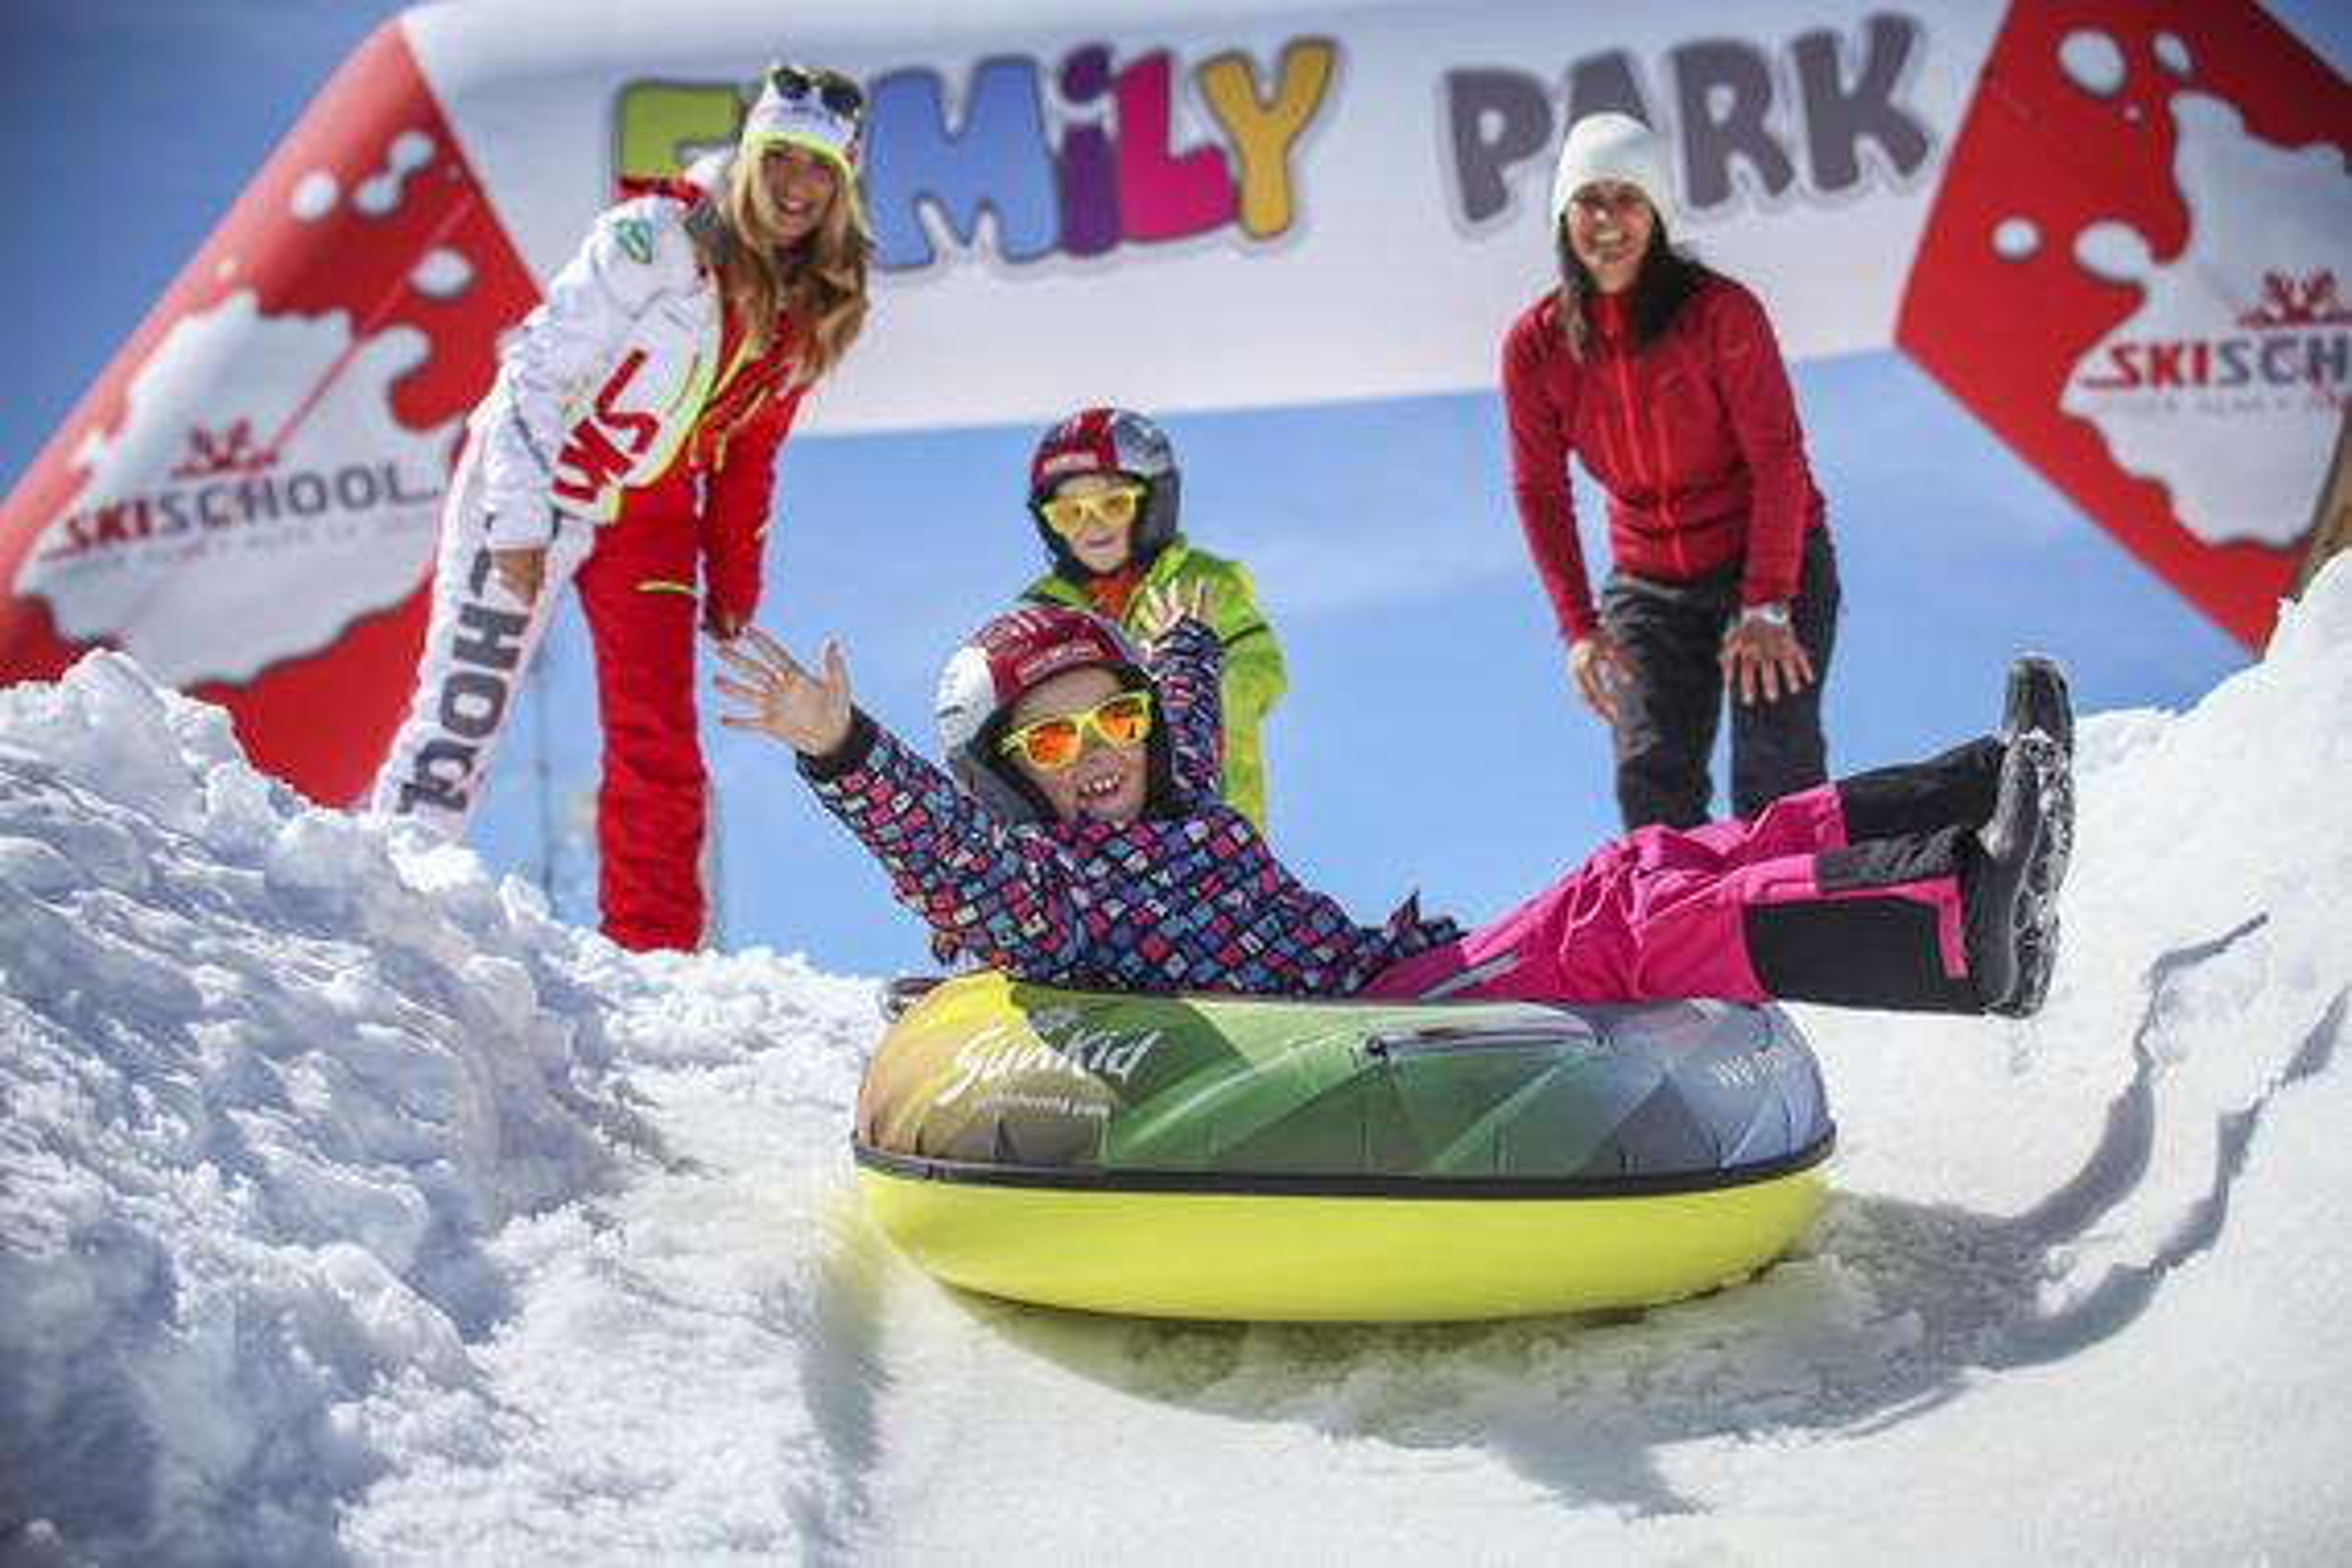 Ski Kindergarten (3-7 years)